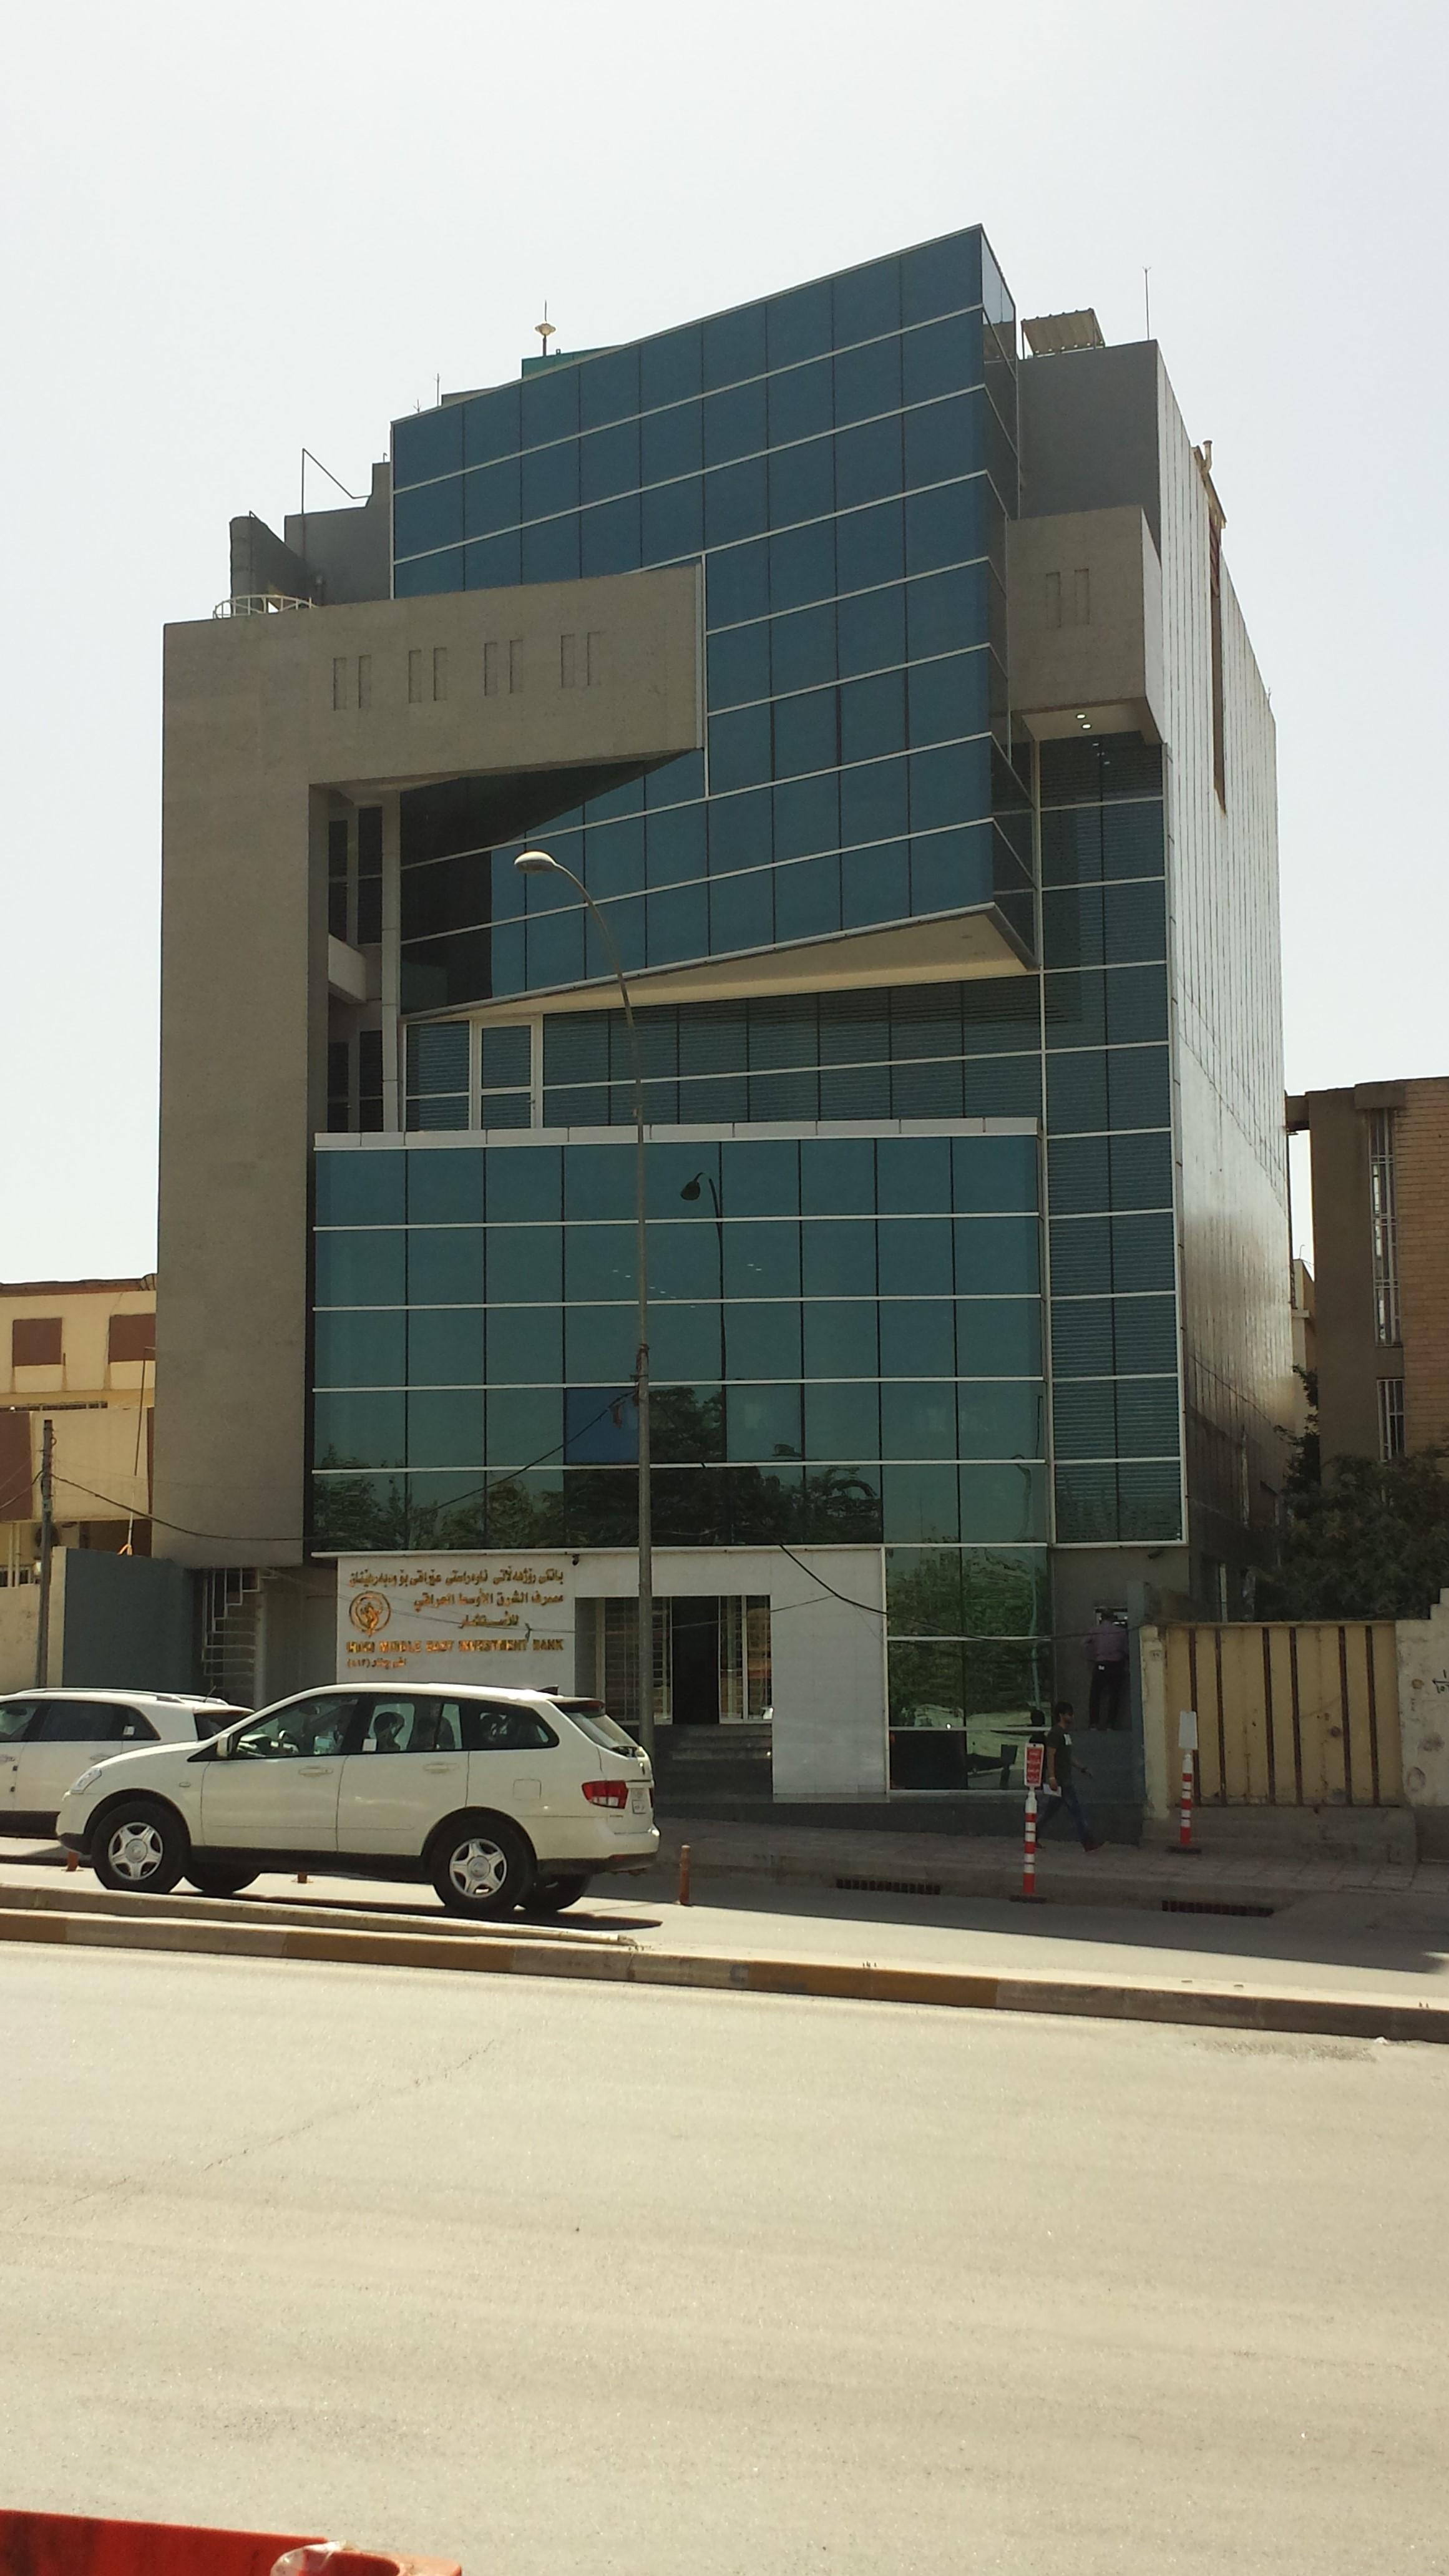 Middle East Bank - Suleymanijah